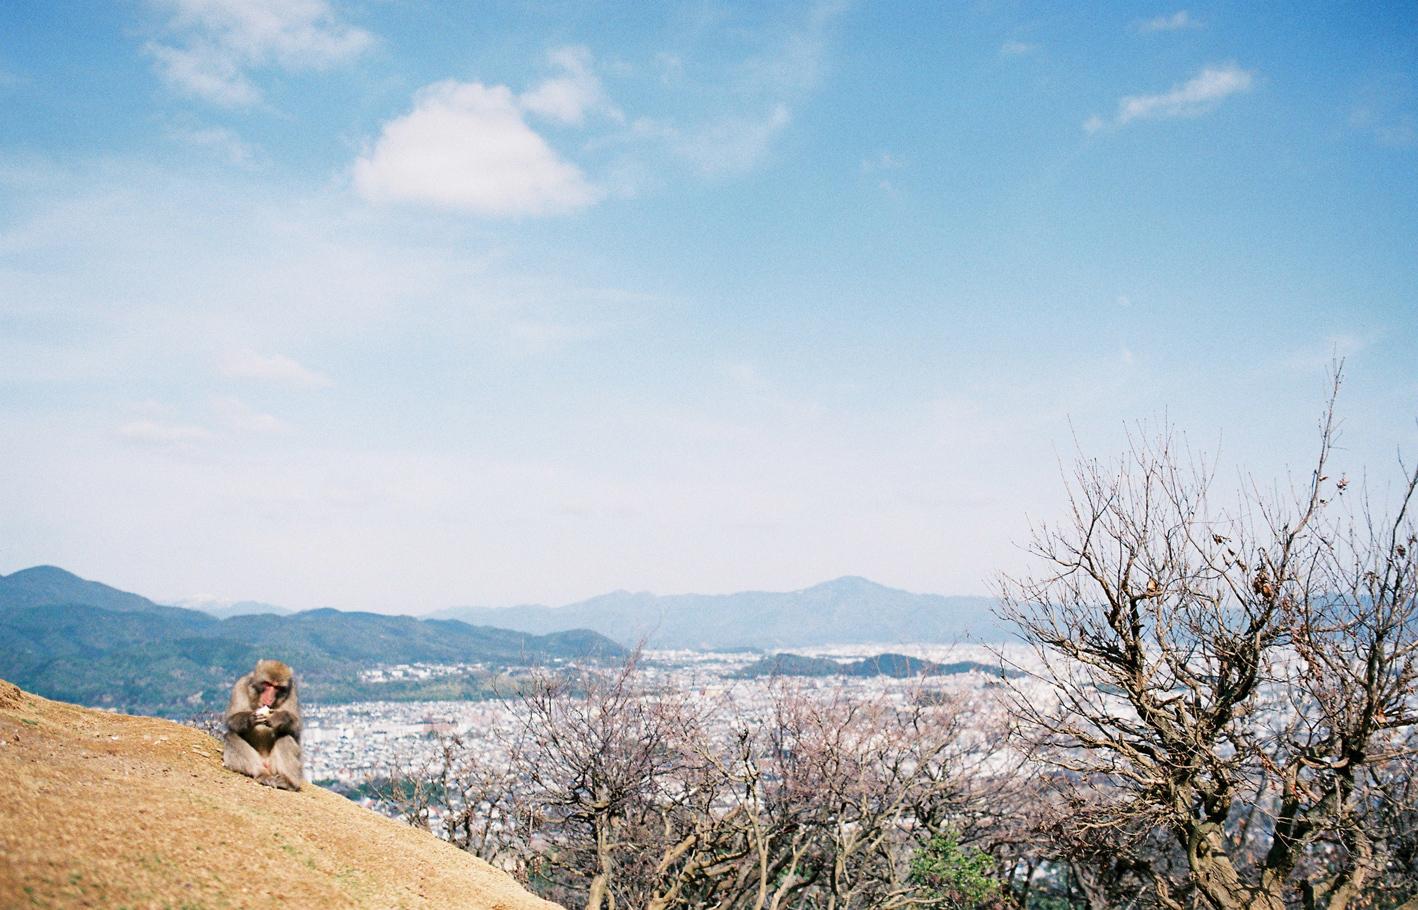 004-kyoto-arashiyama-sophie-baker-photography